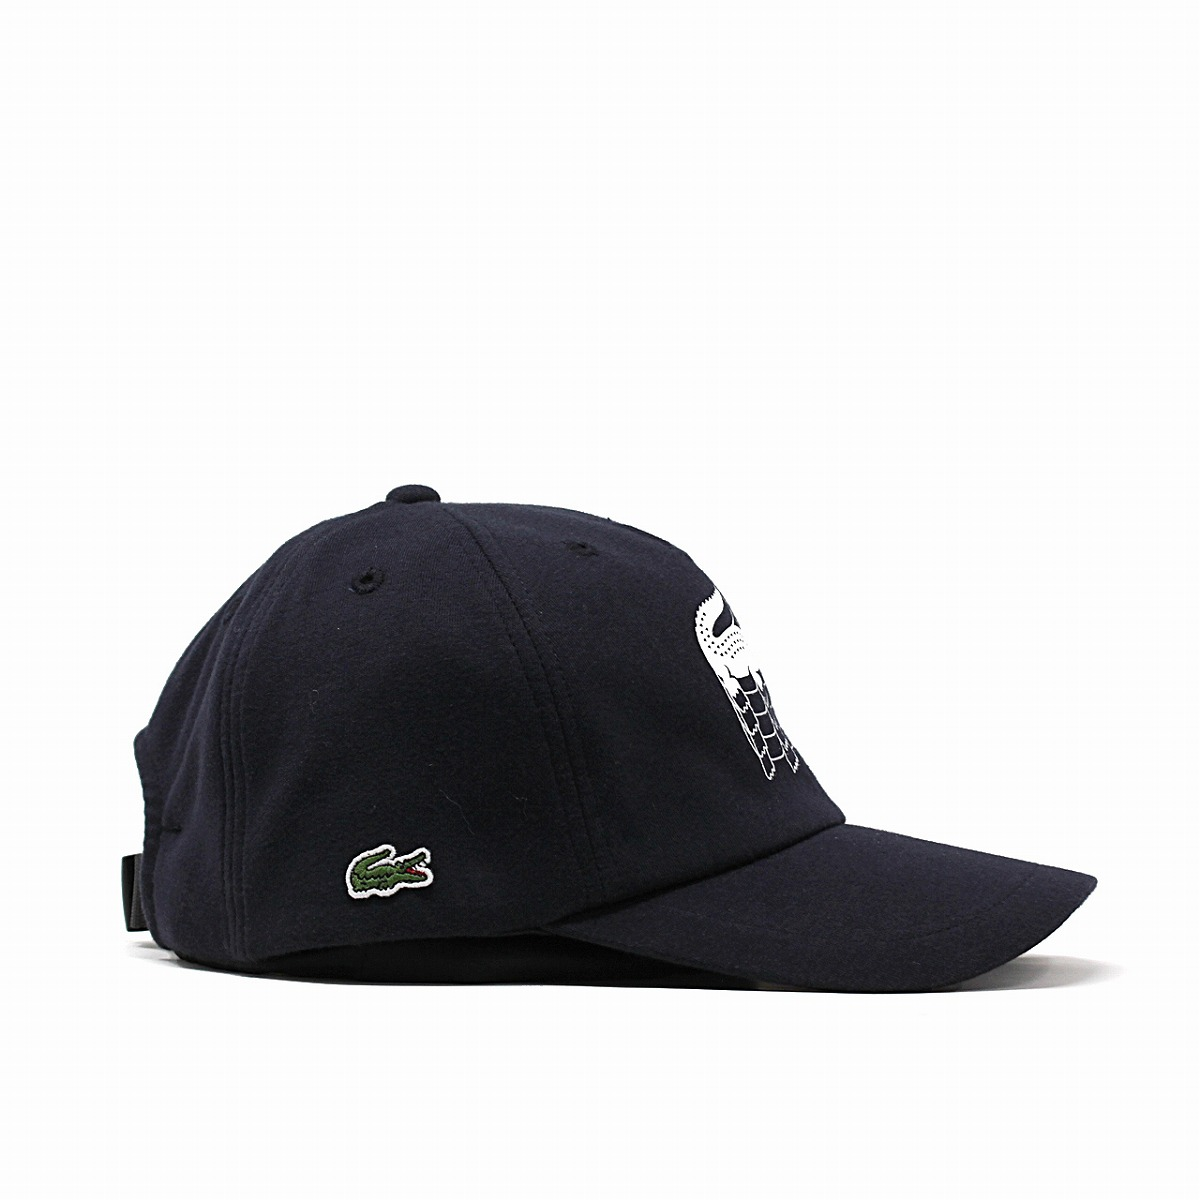 21f0dafcd3c ELEHELM HAT STORE  Men gap Dis CAP Lacoste hat dark blue navy  cap ...